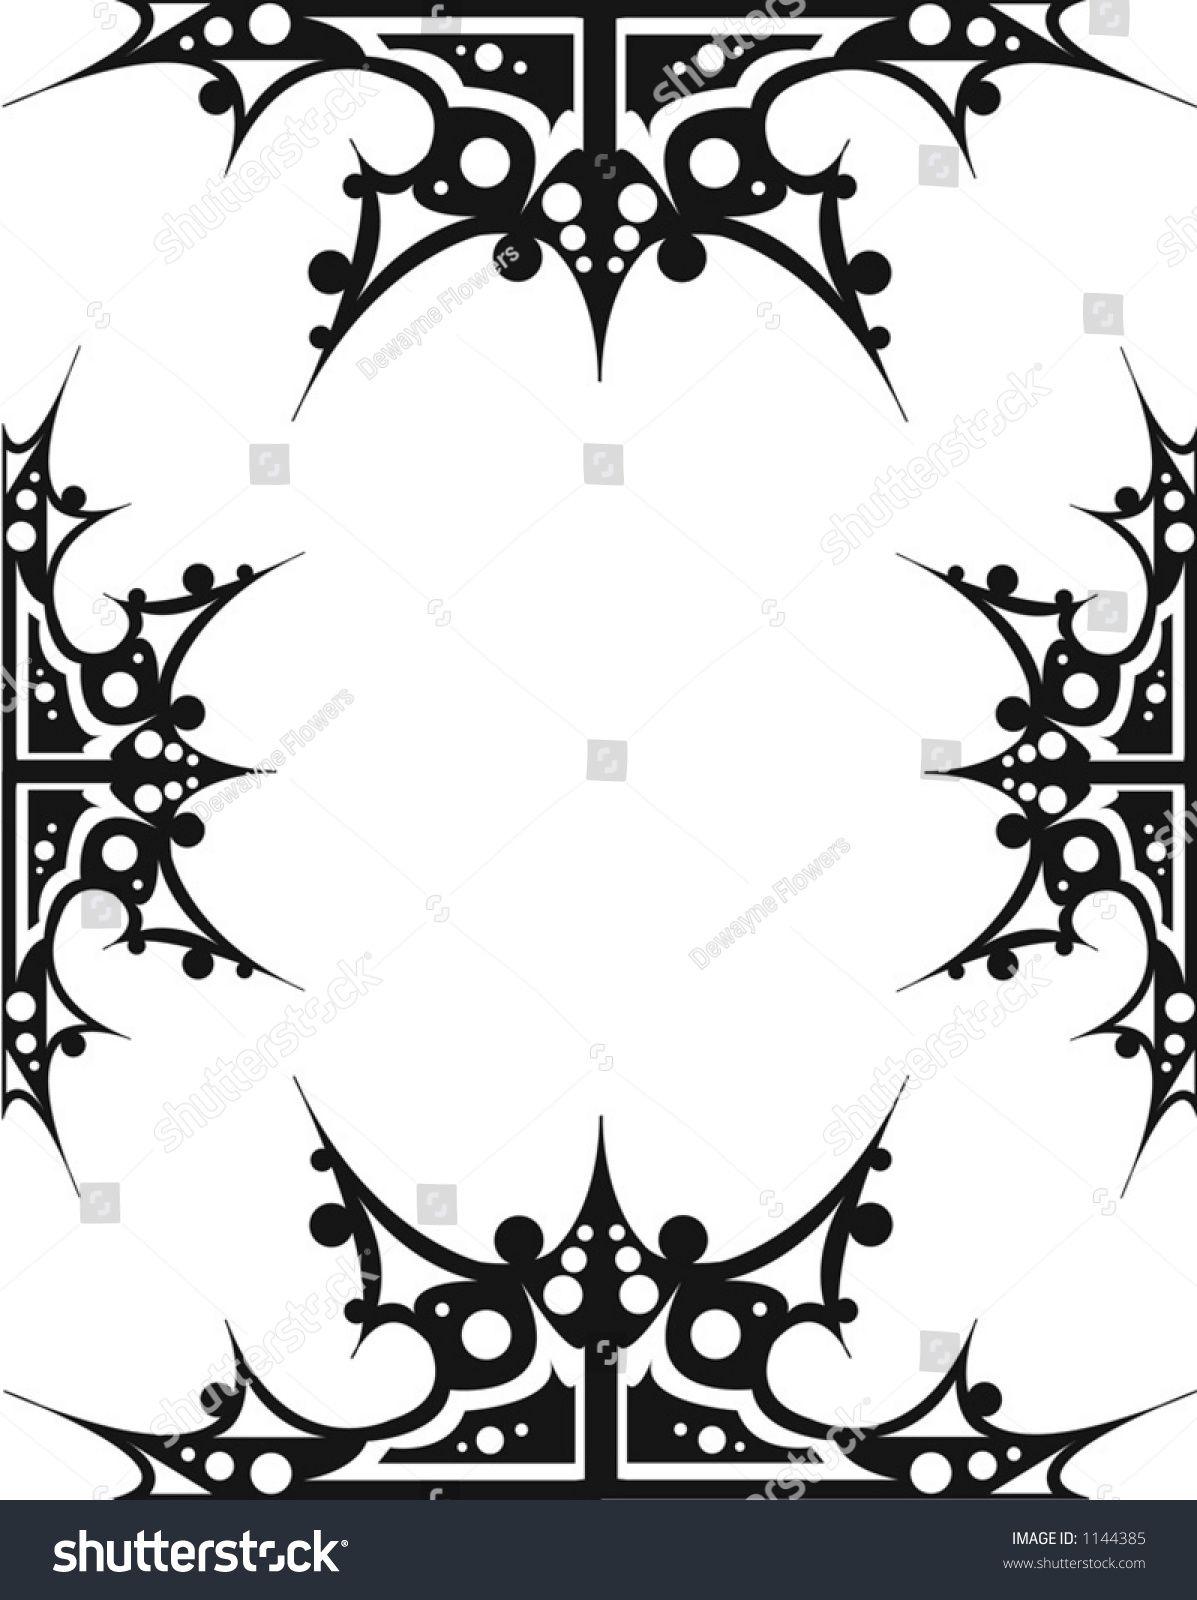 Gothic borders clipart transparent stock Image result for gothic border design   Career and Portfolio ... transparent stock